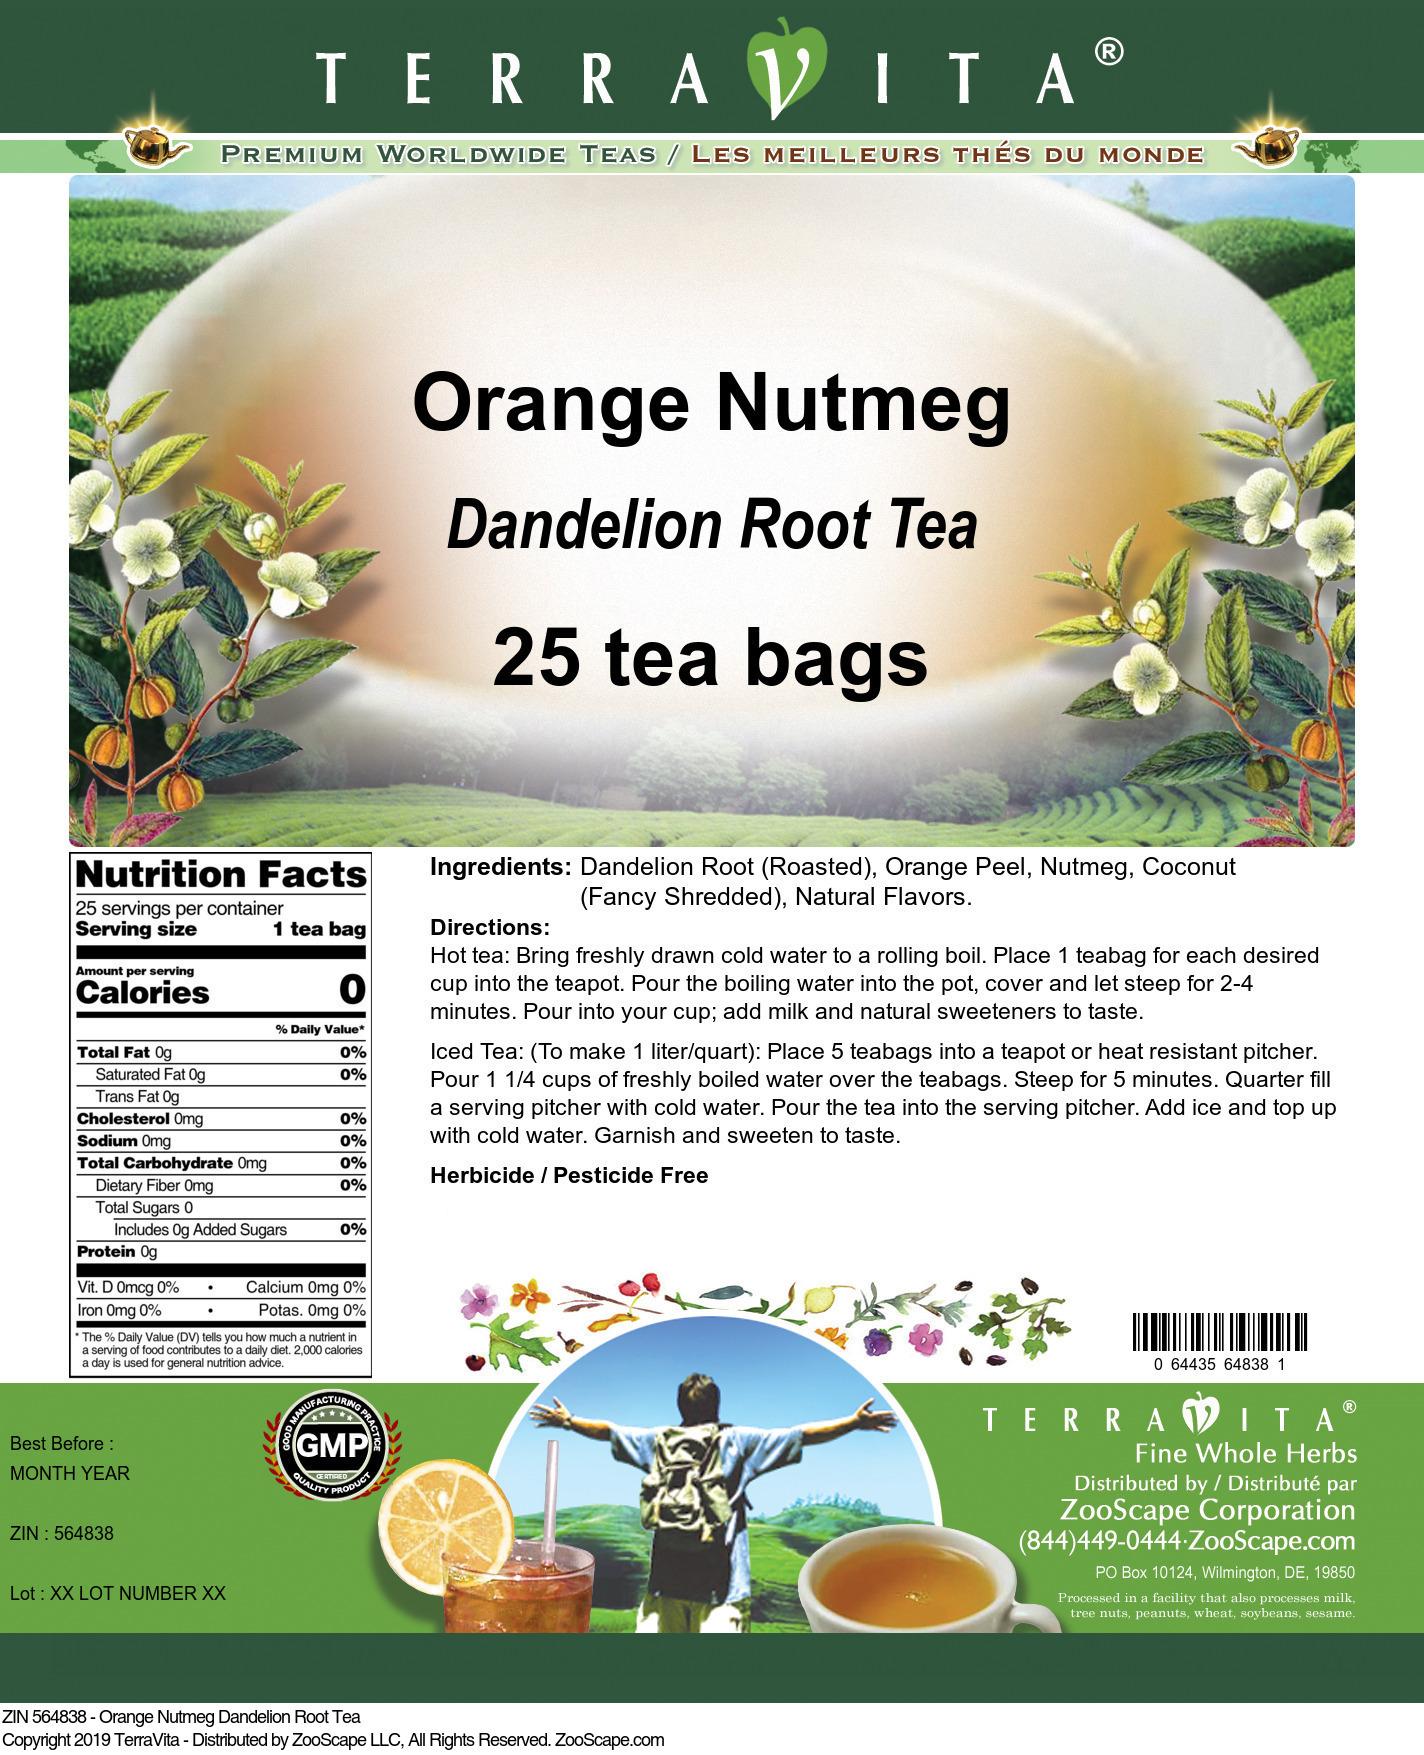 Orange Nutmeg Dandelion Root Tea